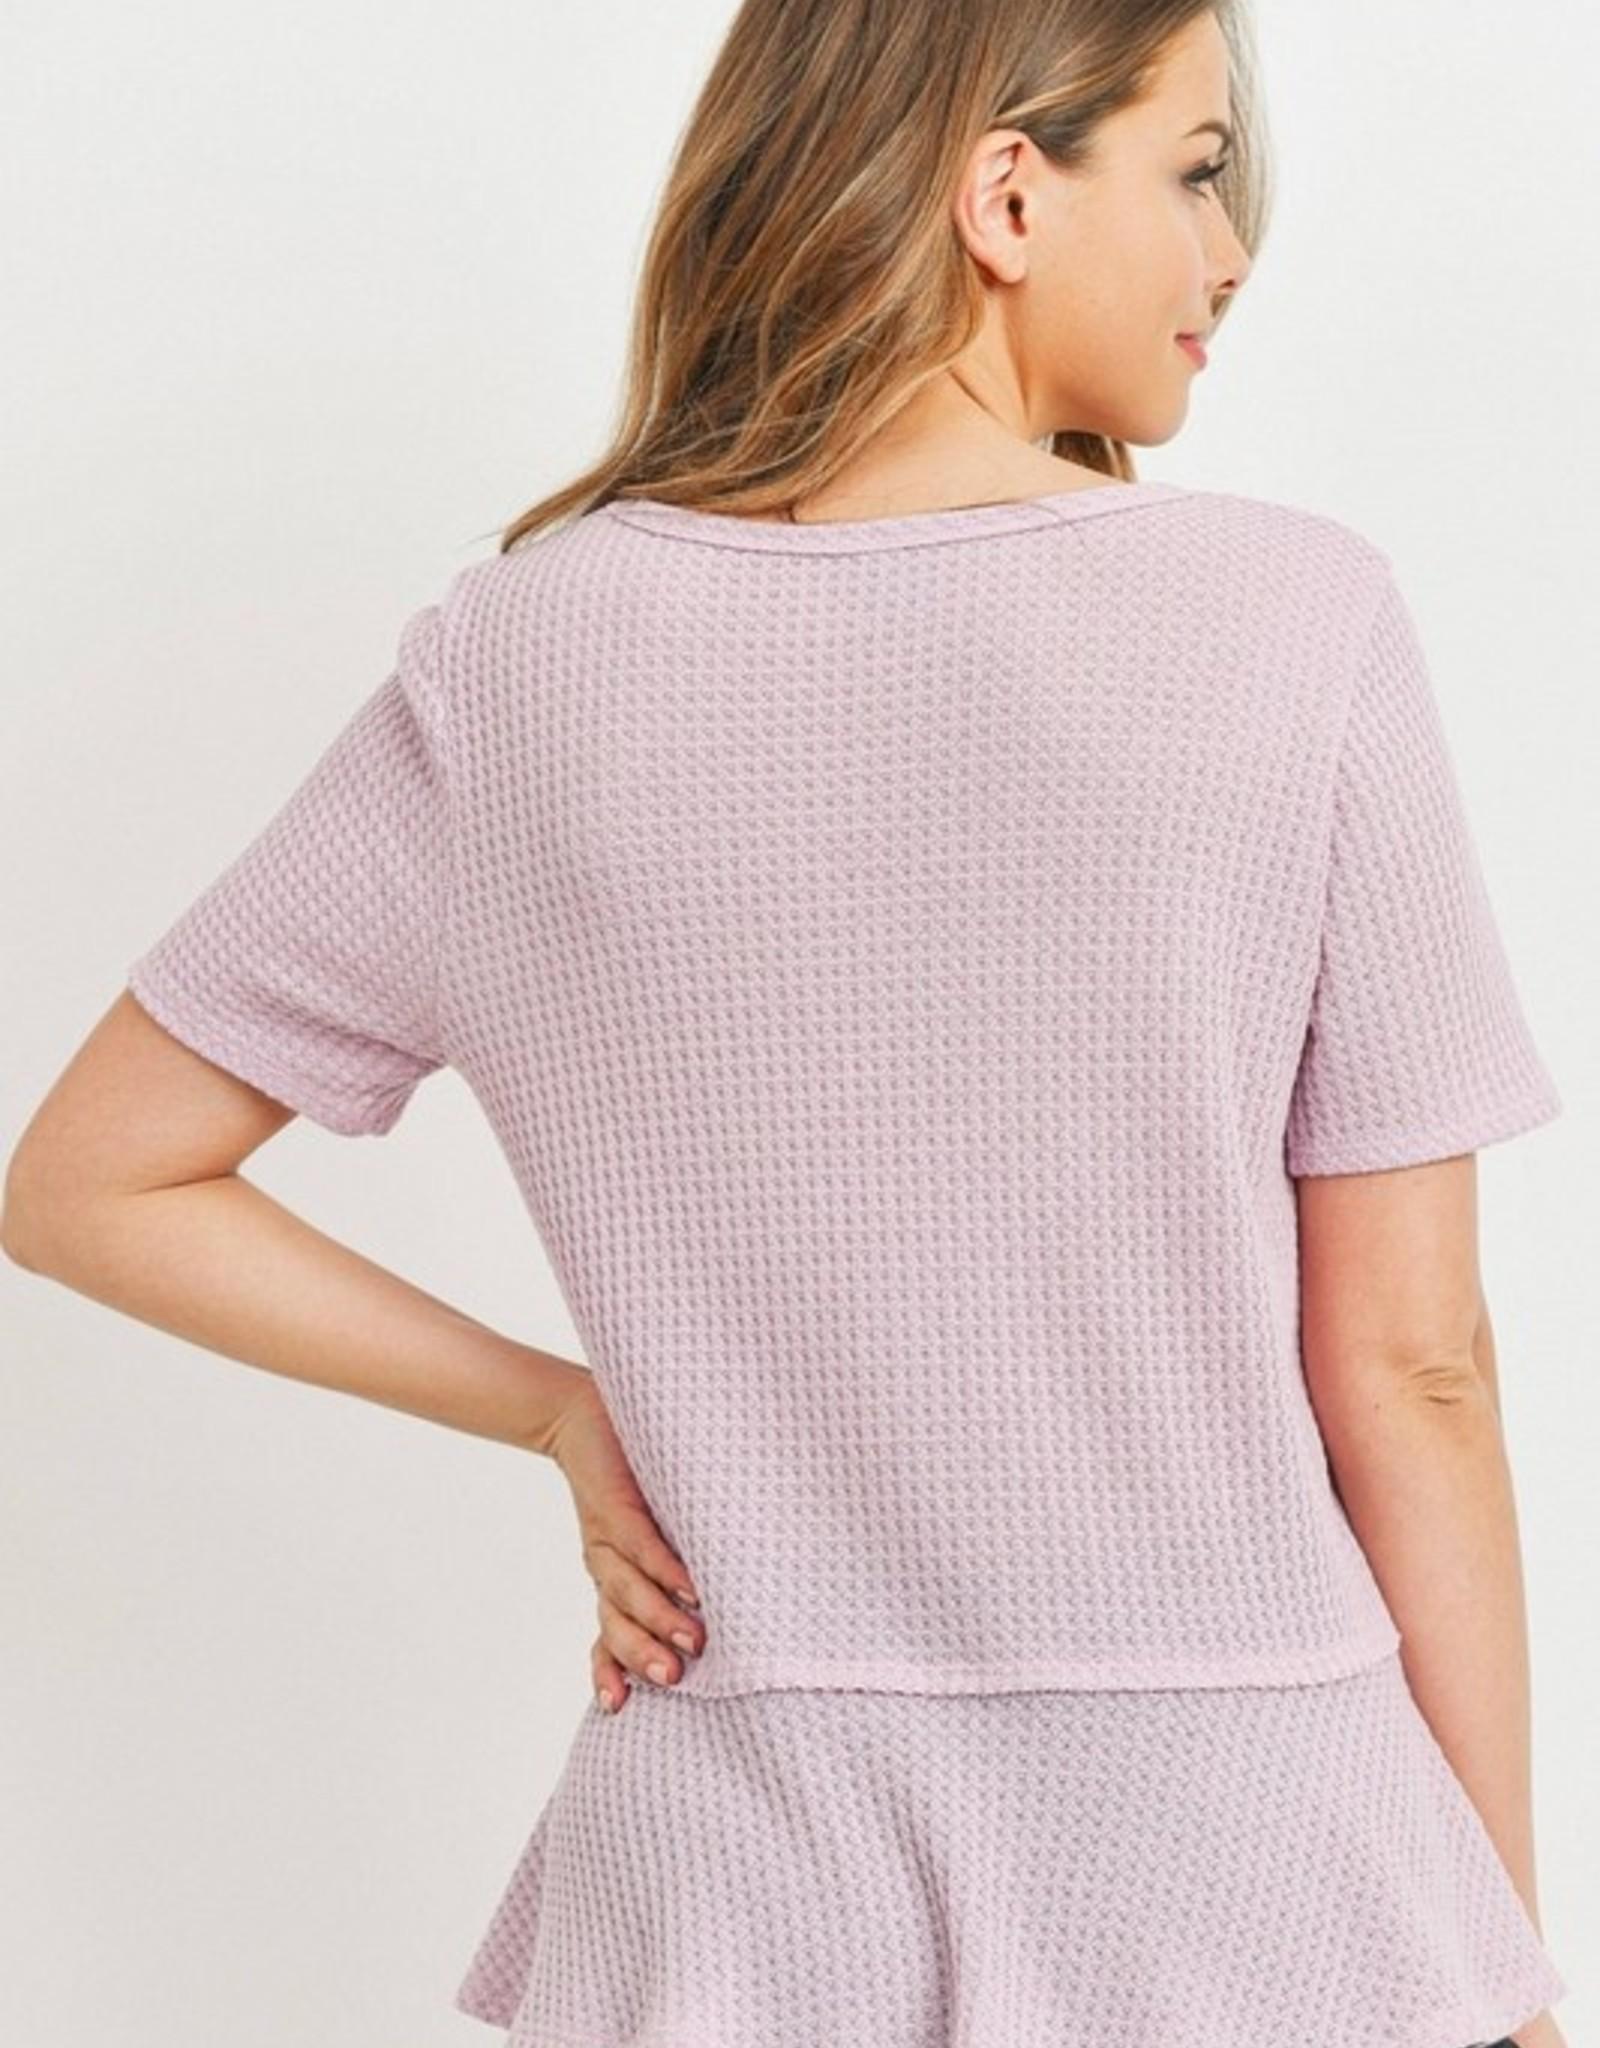 Thermal short sleeve peplum top